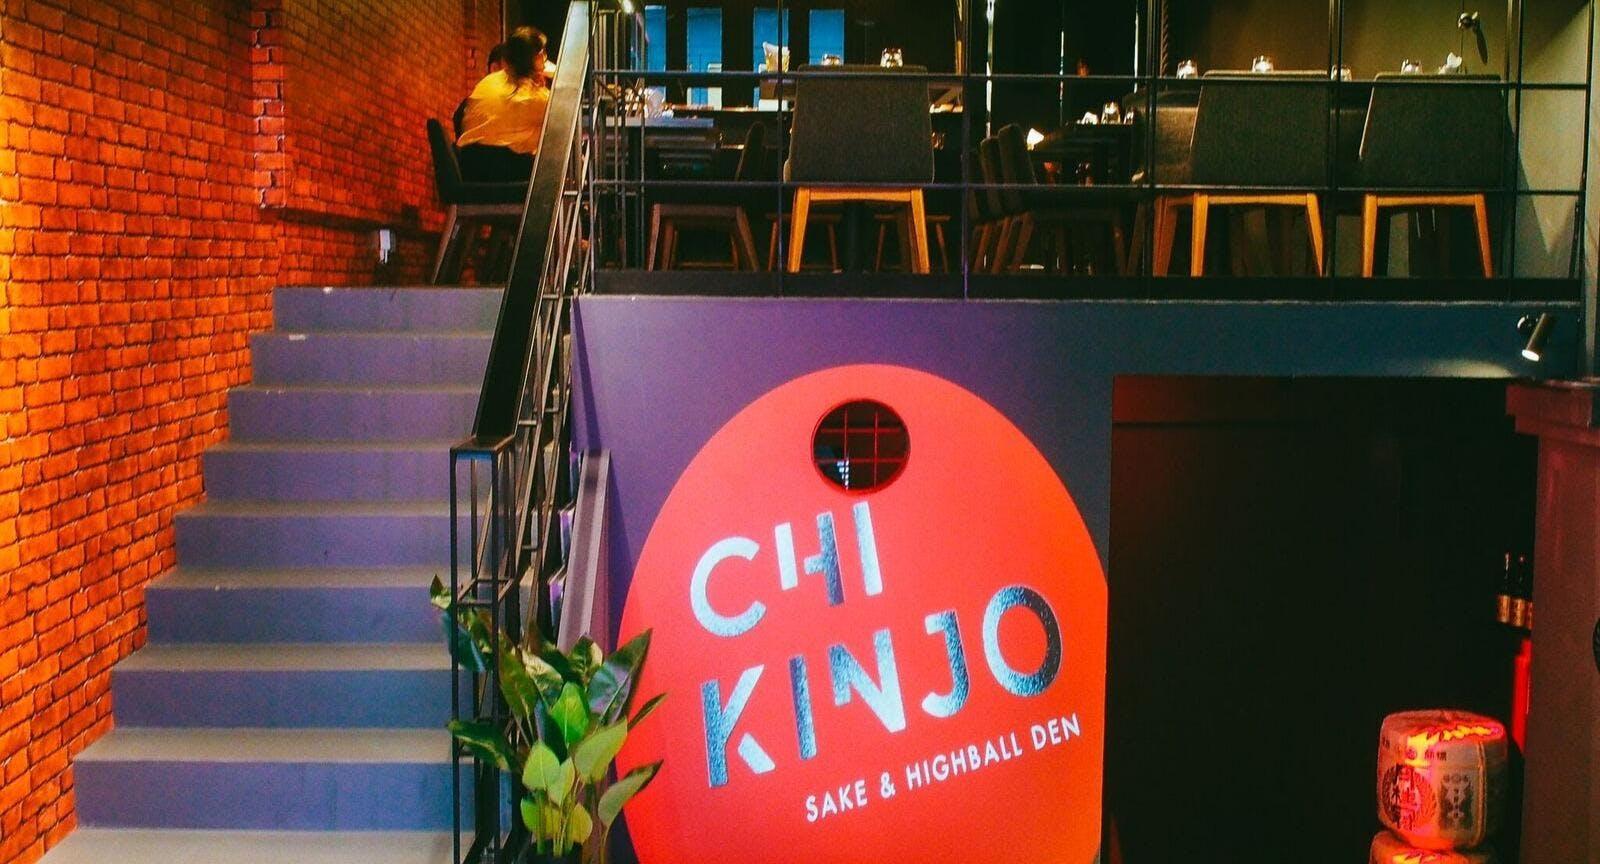 Chi Kinjo Singapore image 2